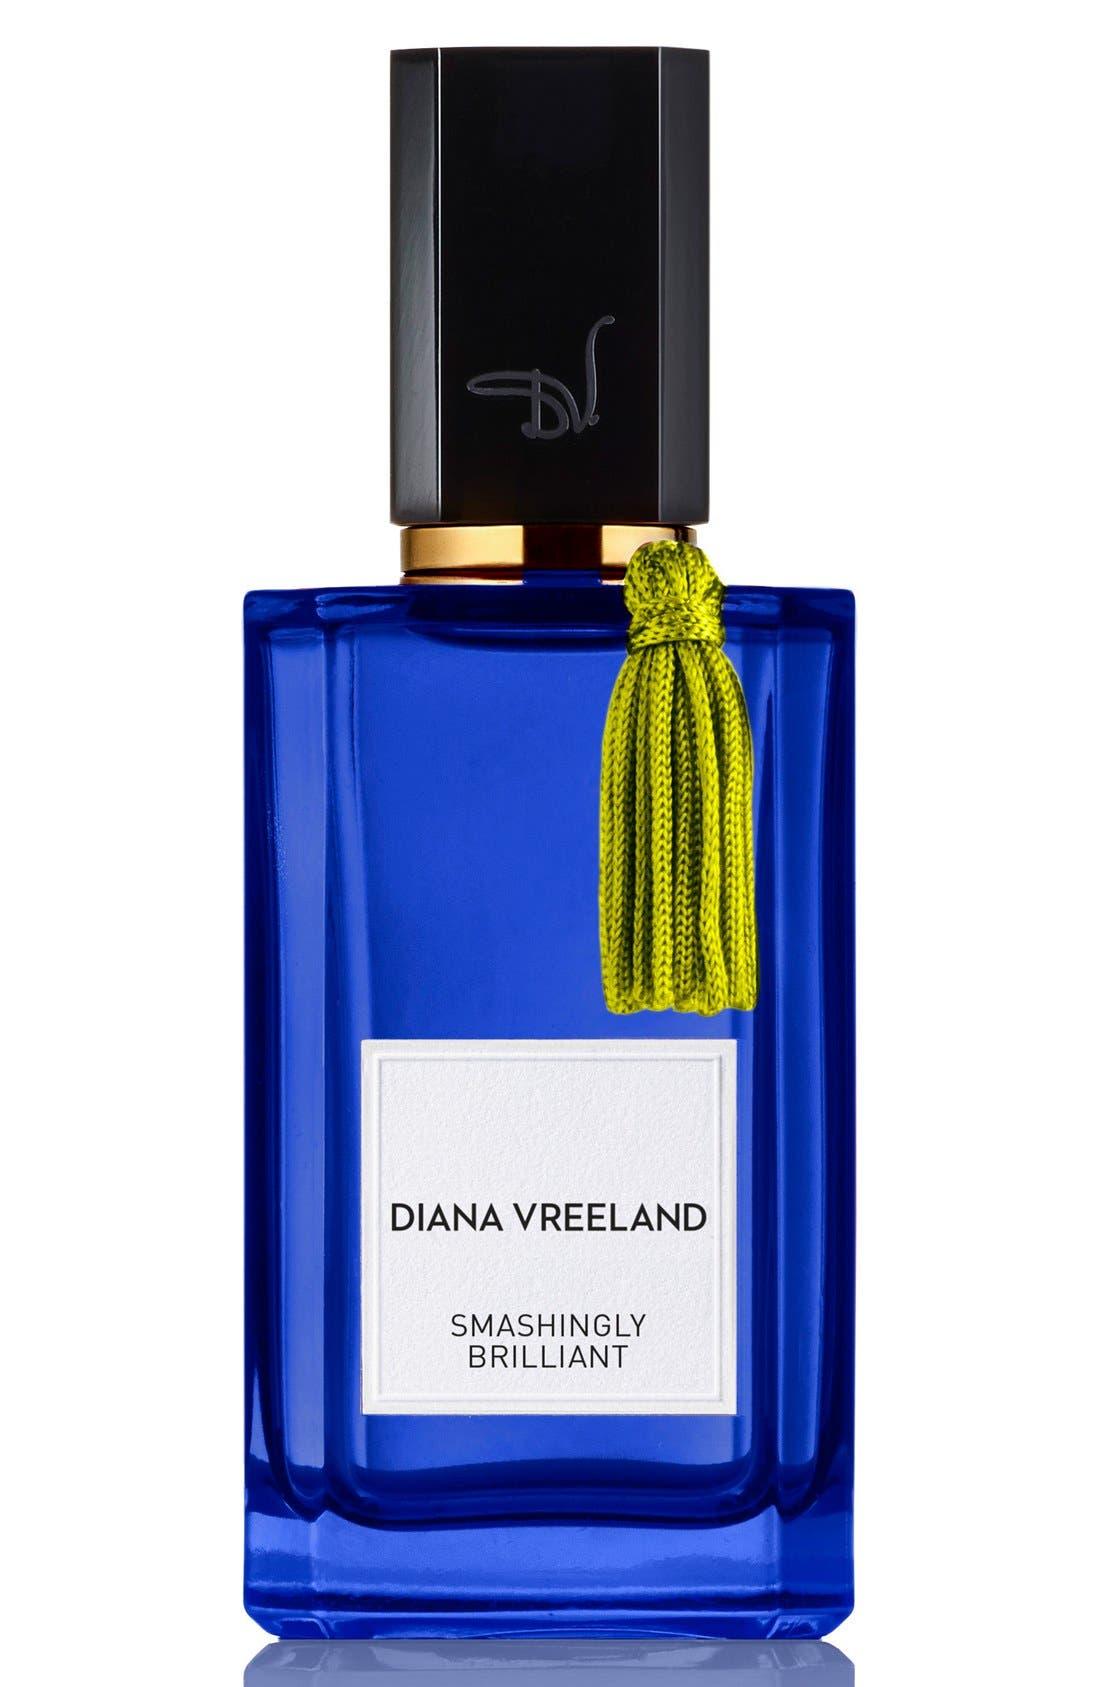 Diana Vreeland 'Smashingly Brilliant' Fragrance